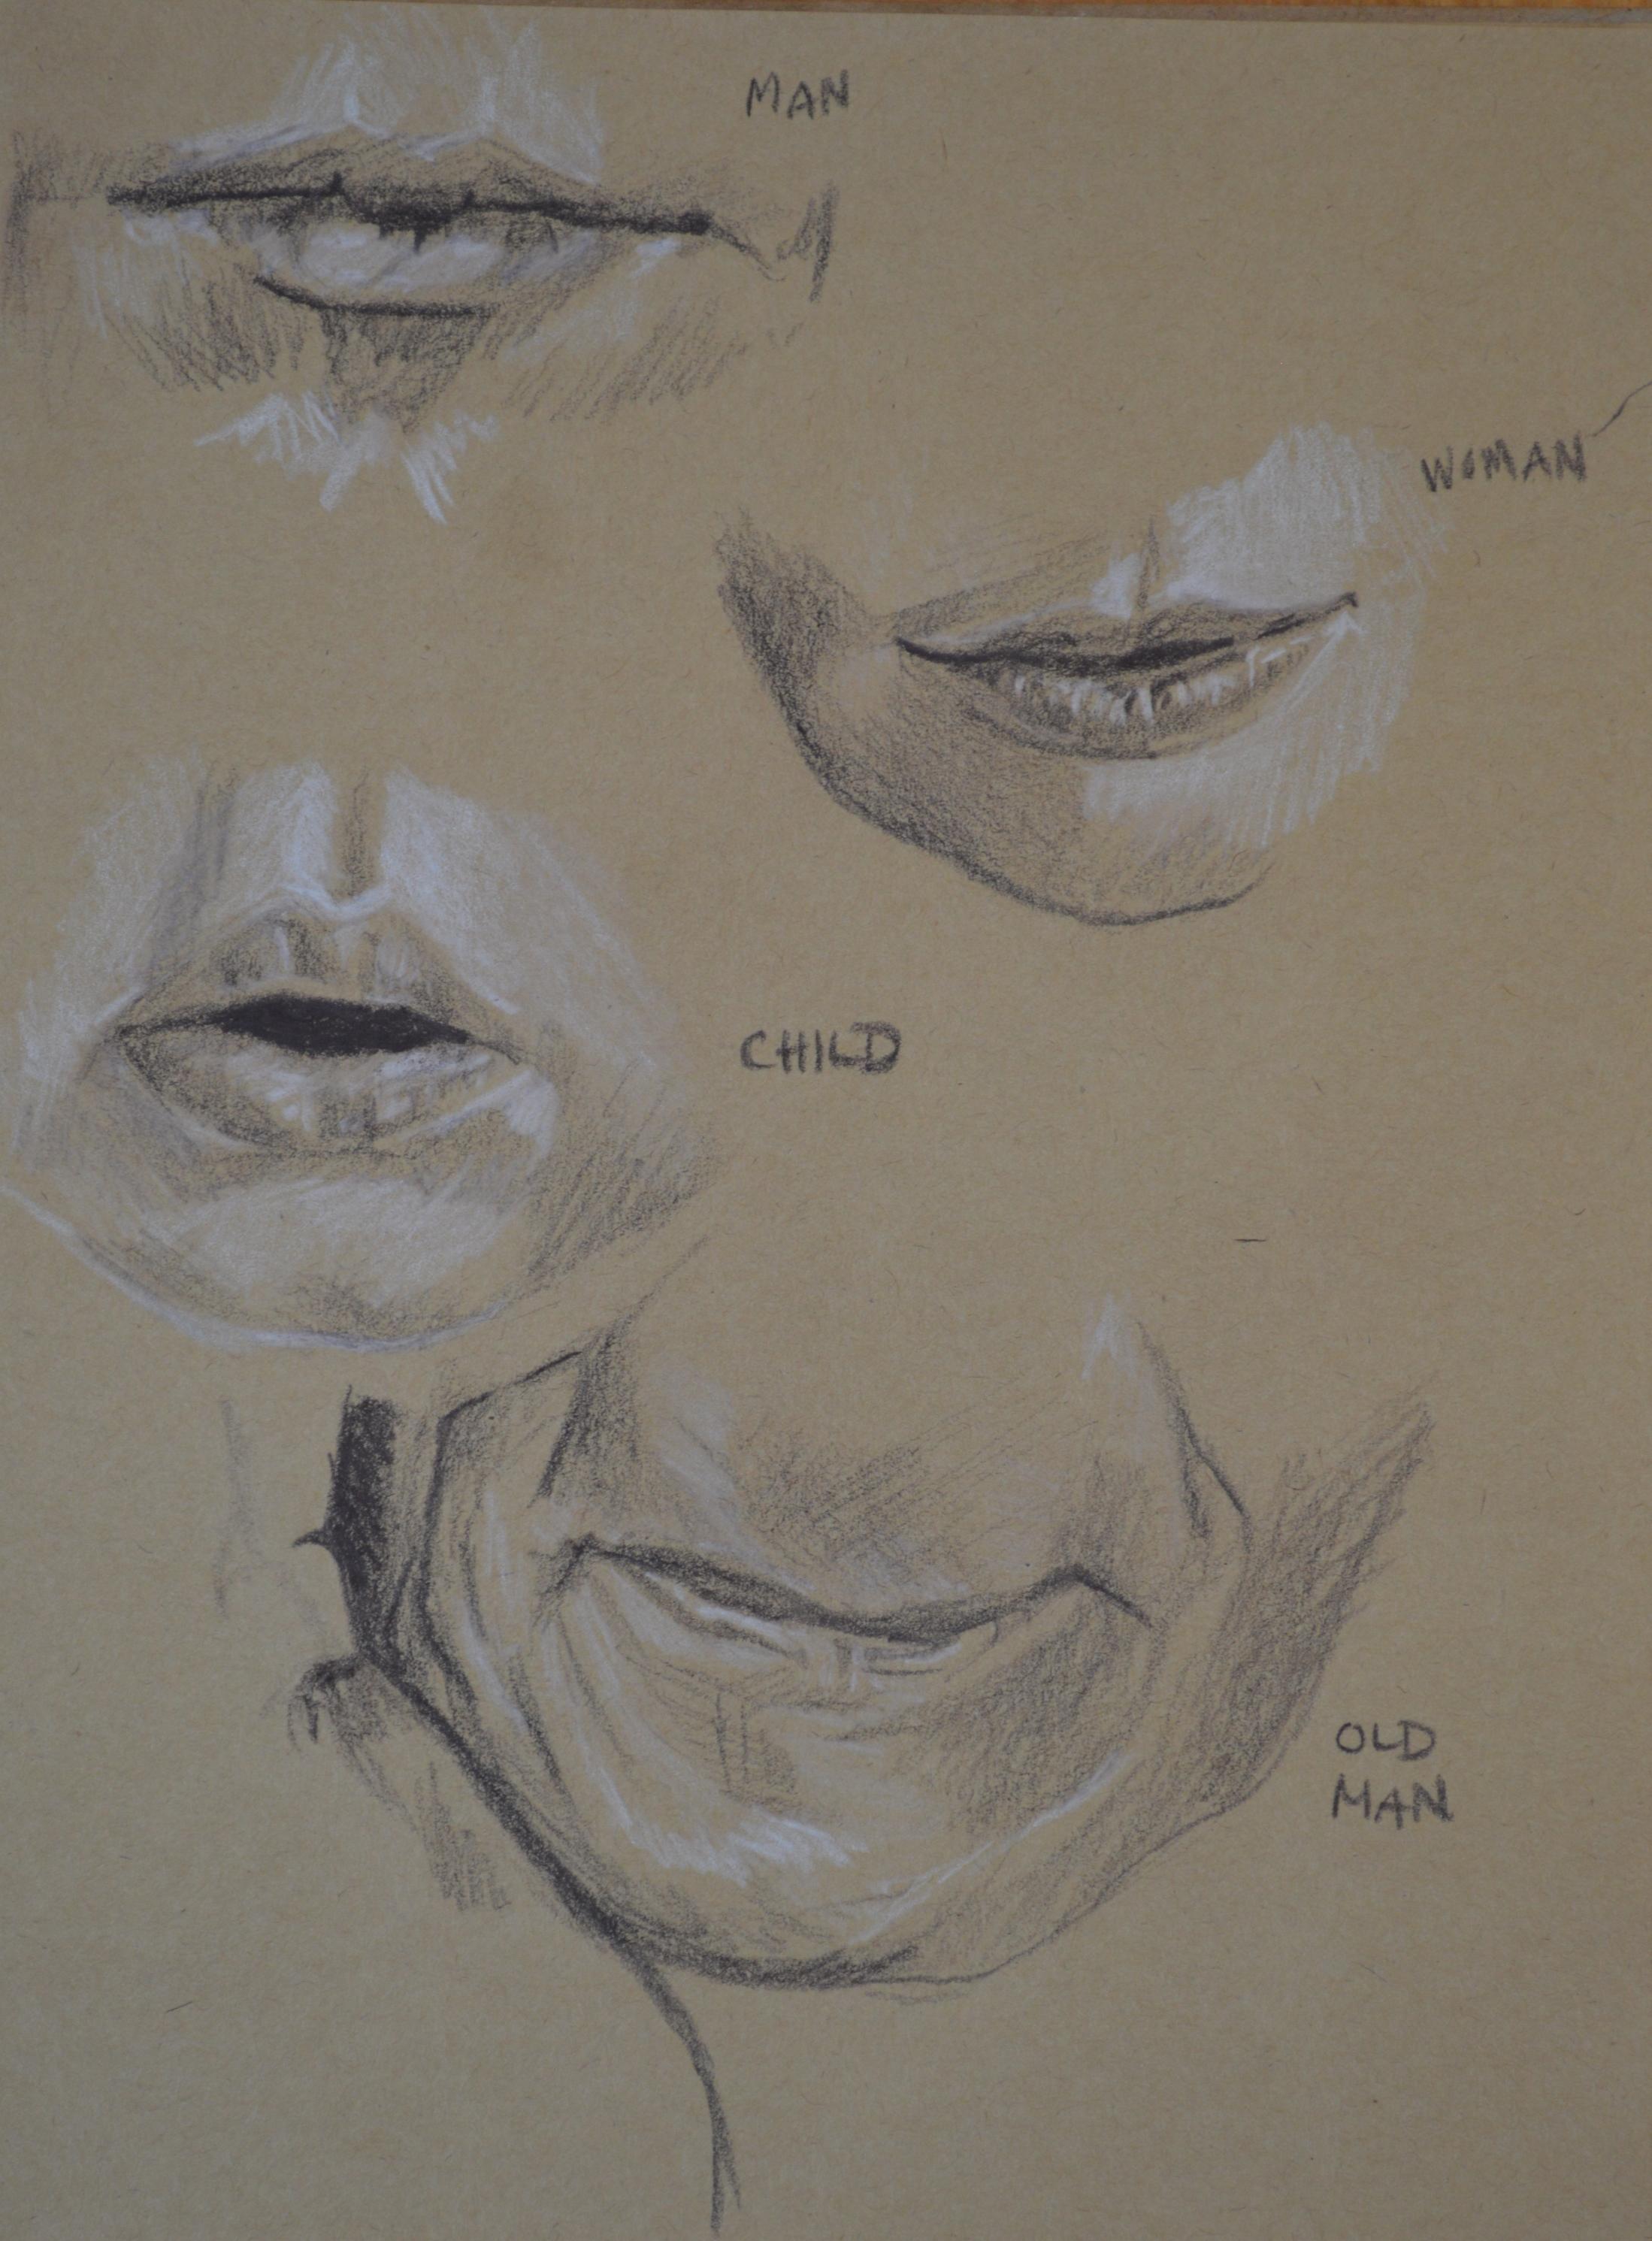 Study of lips